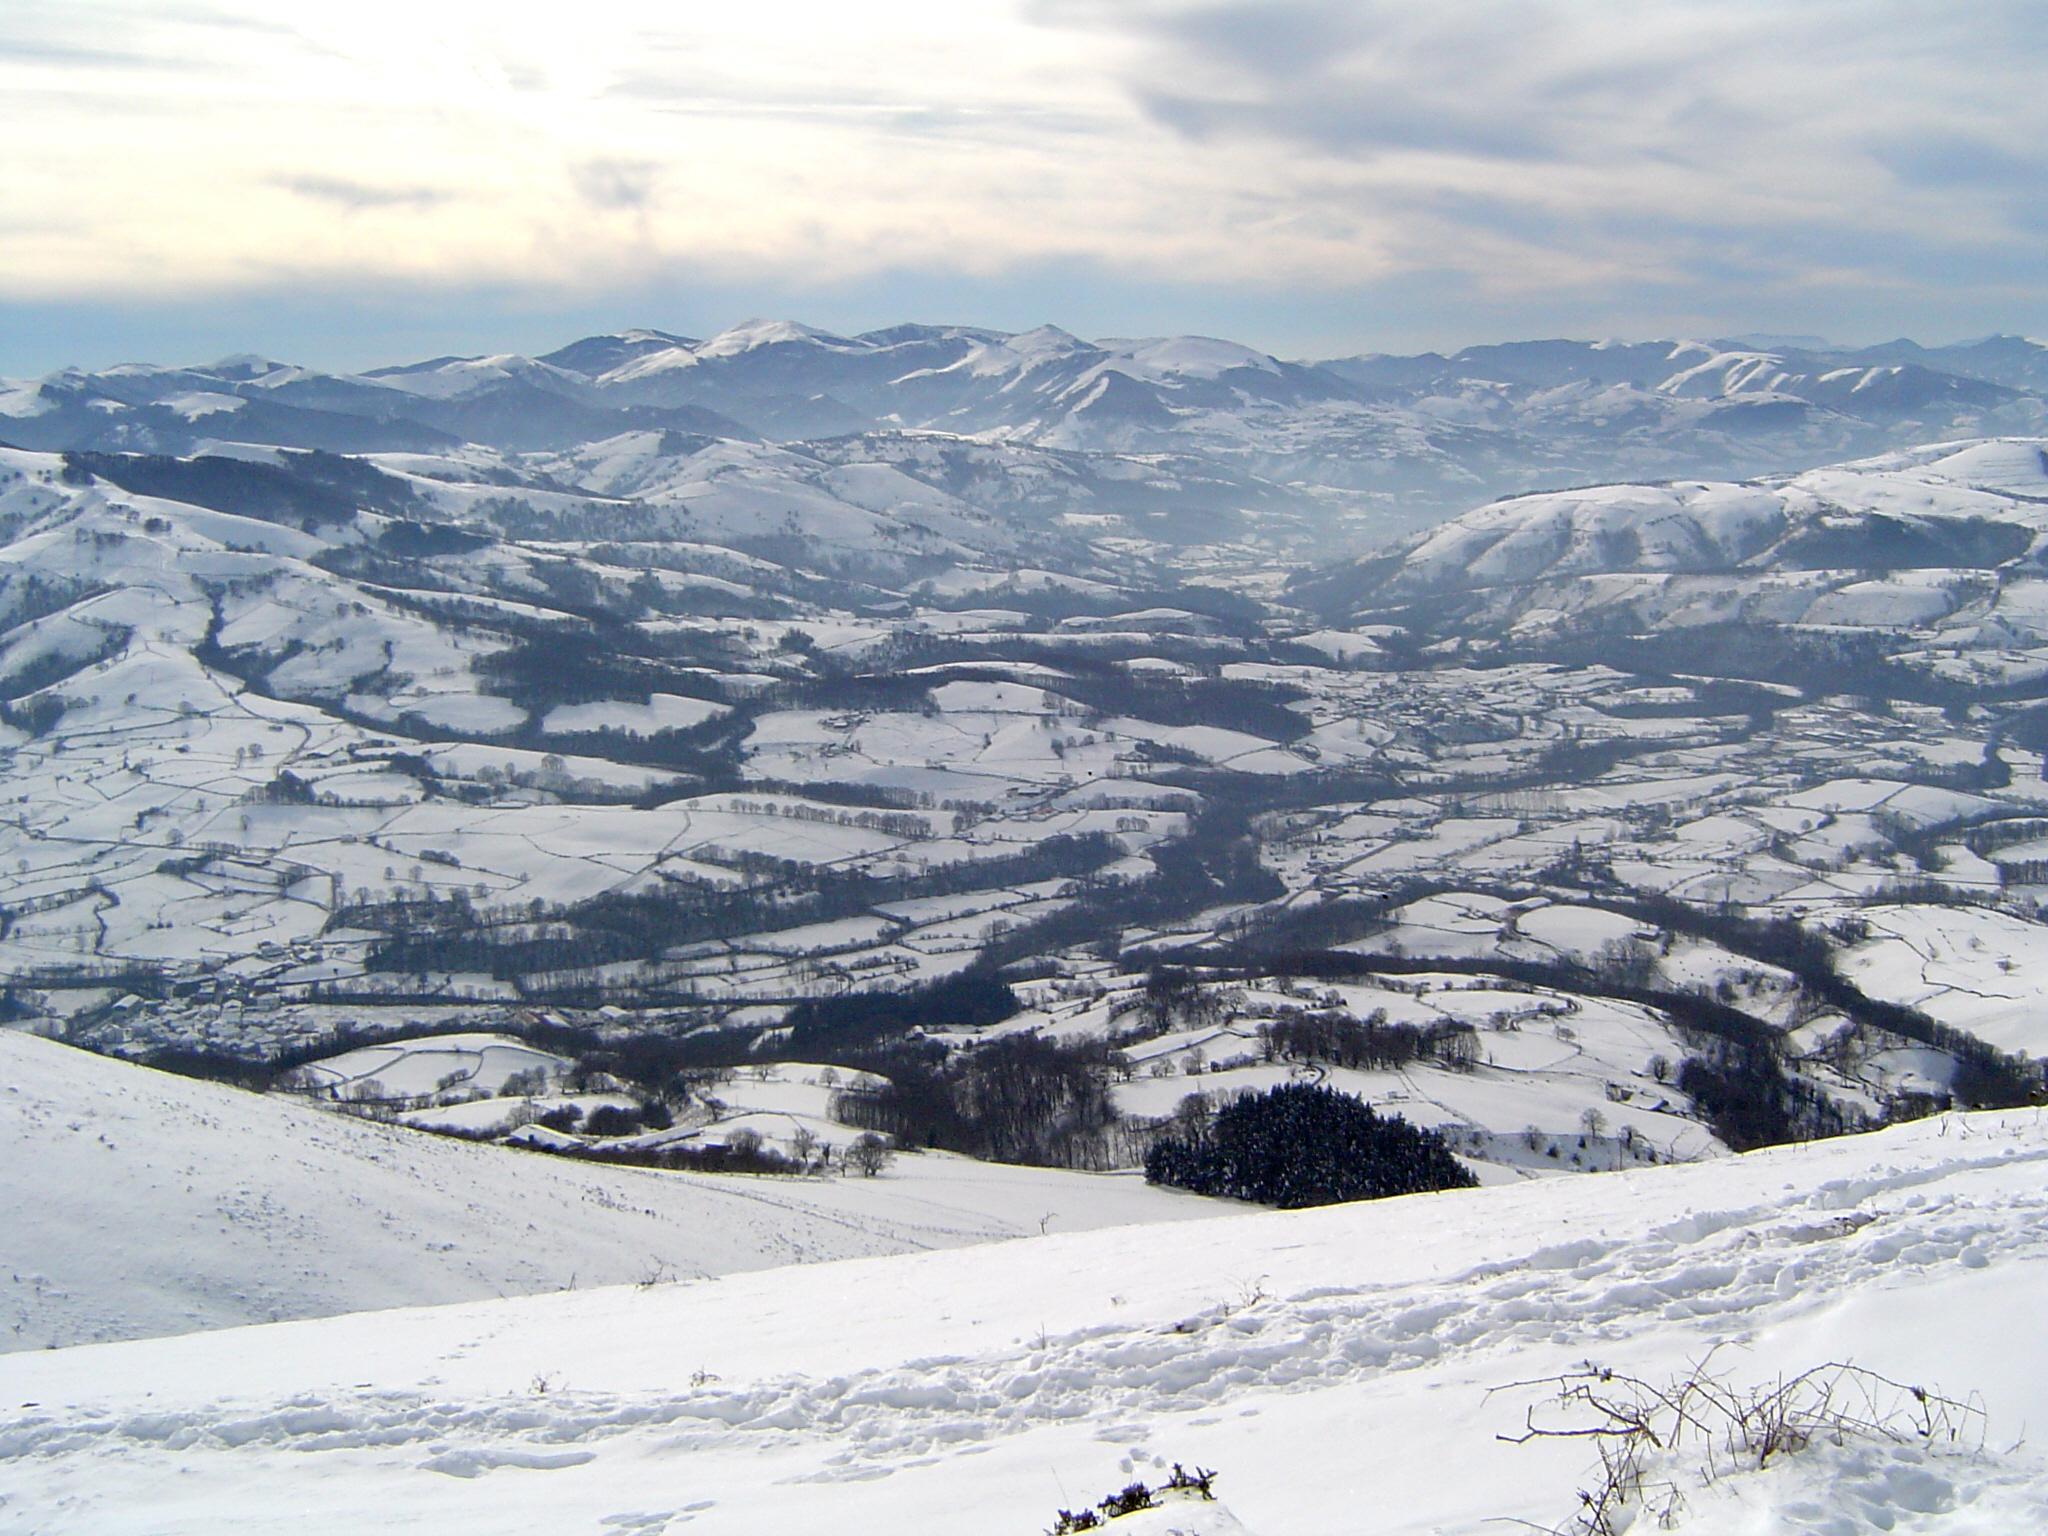 pyrenees-baztan-valley-in-winter-1106878